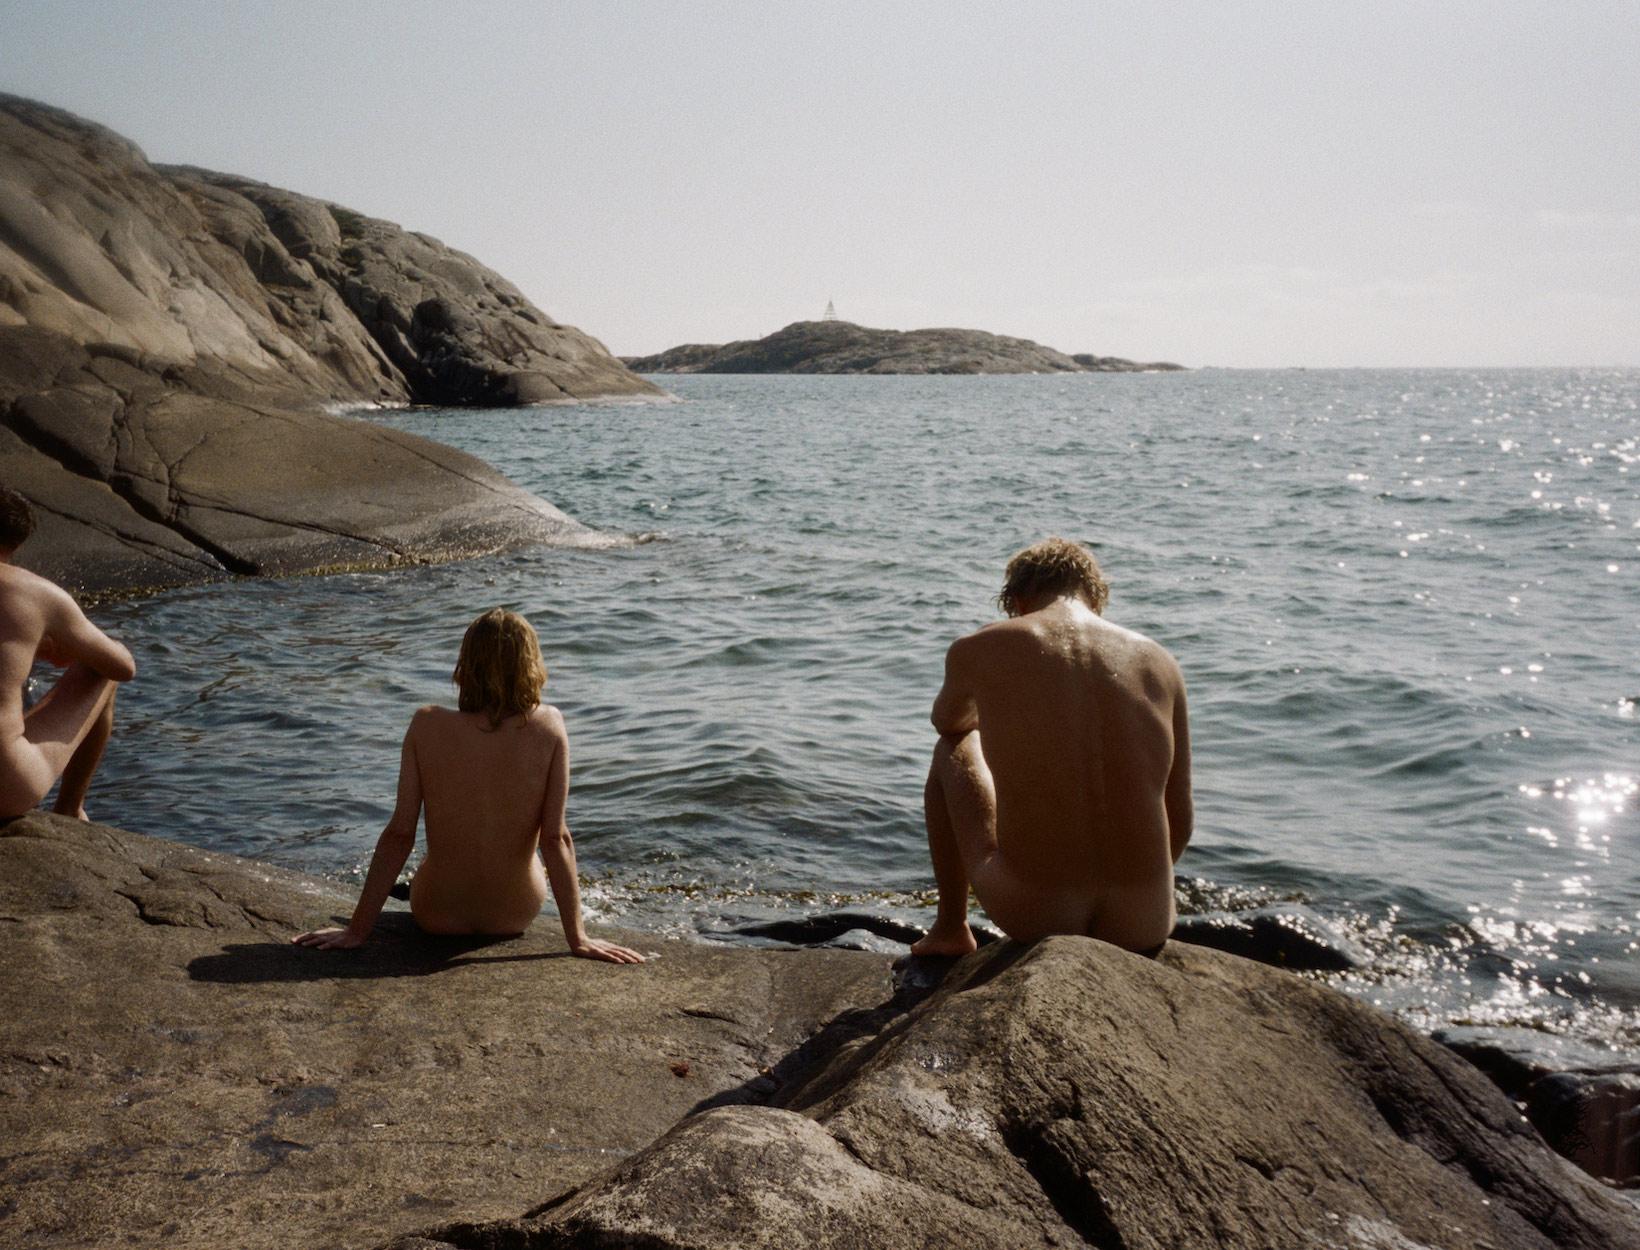 naked on rocks